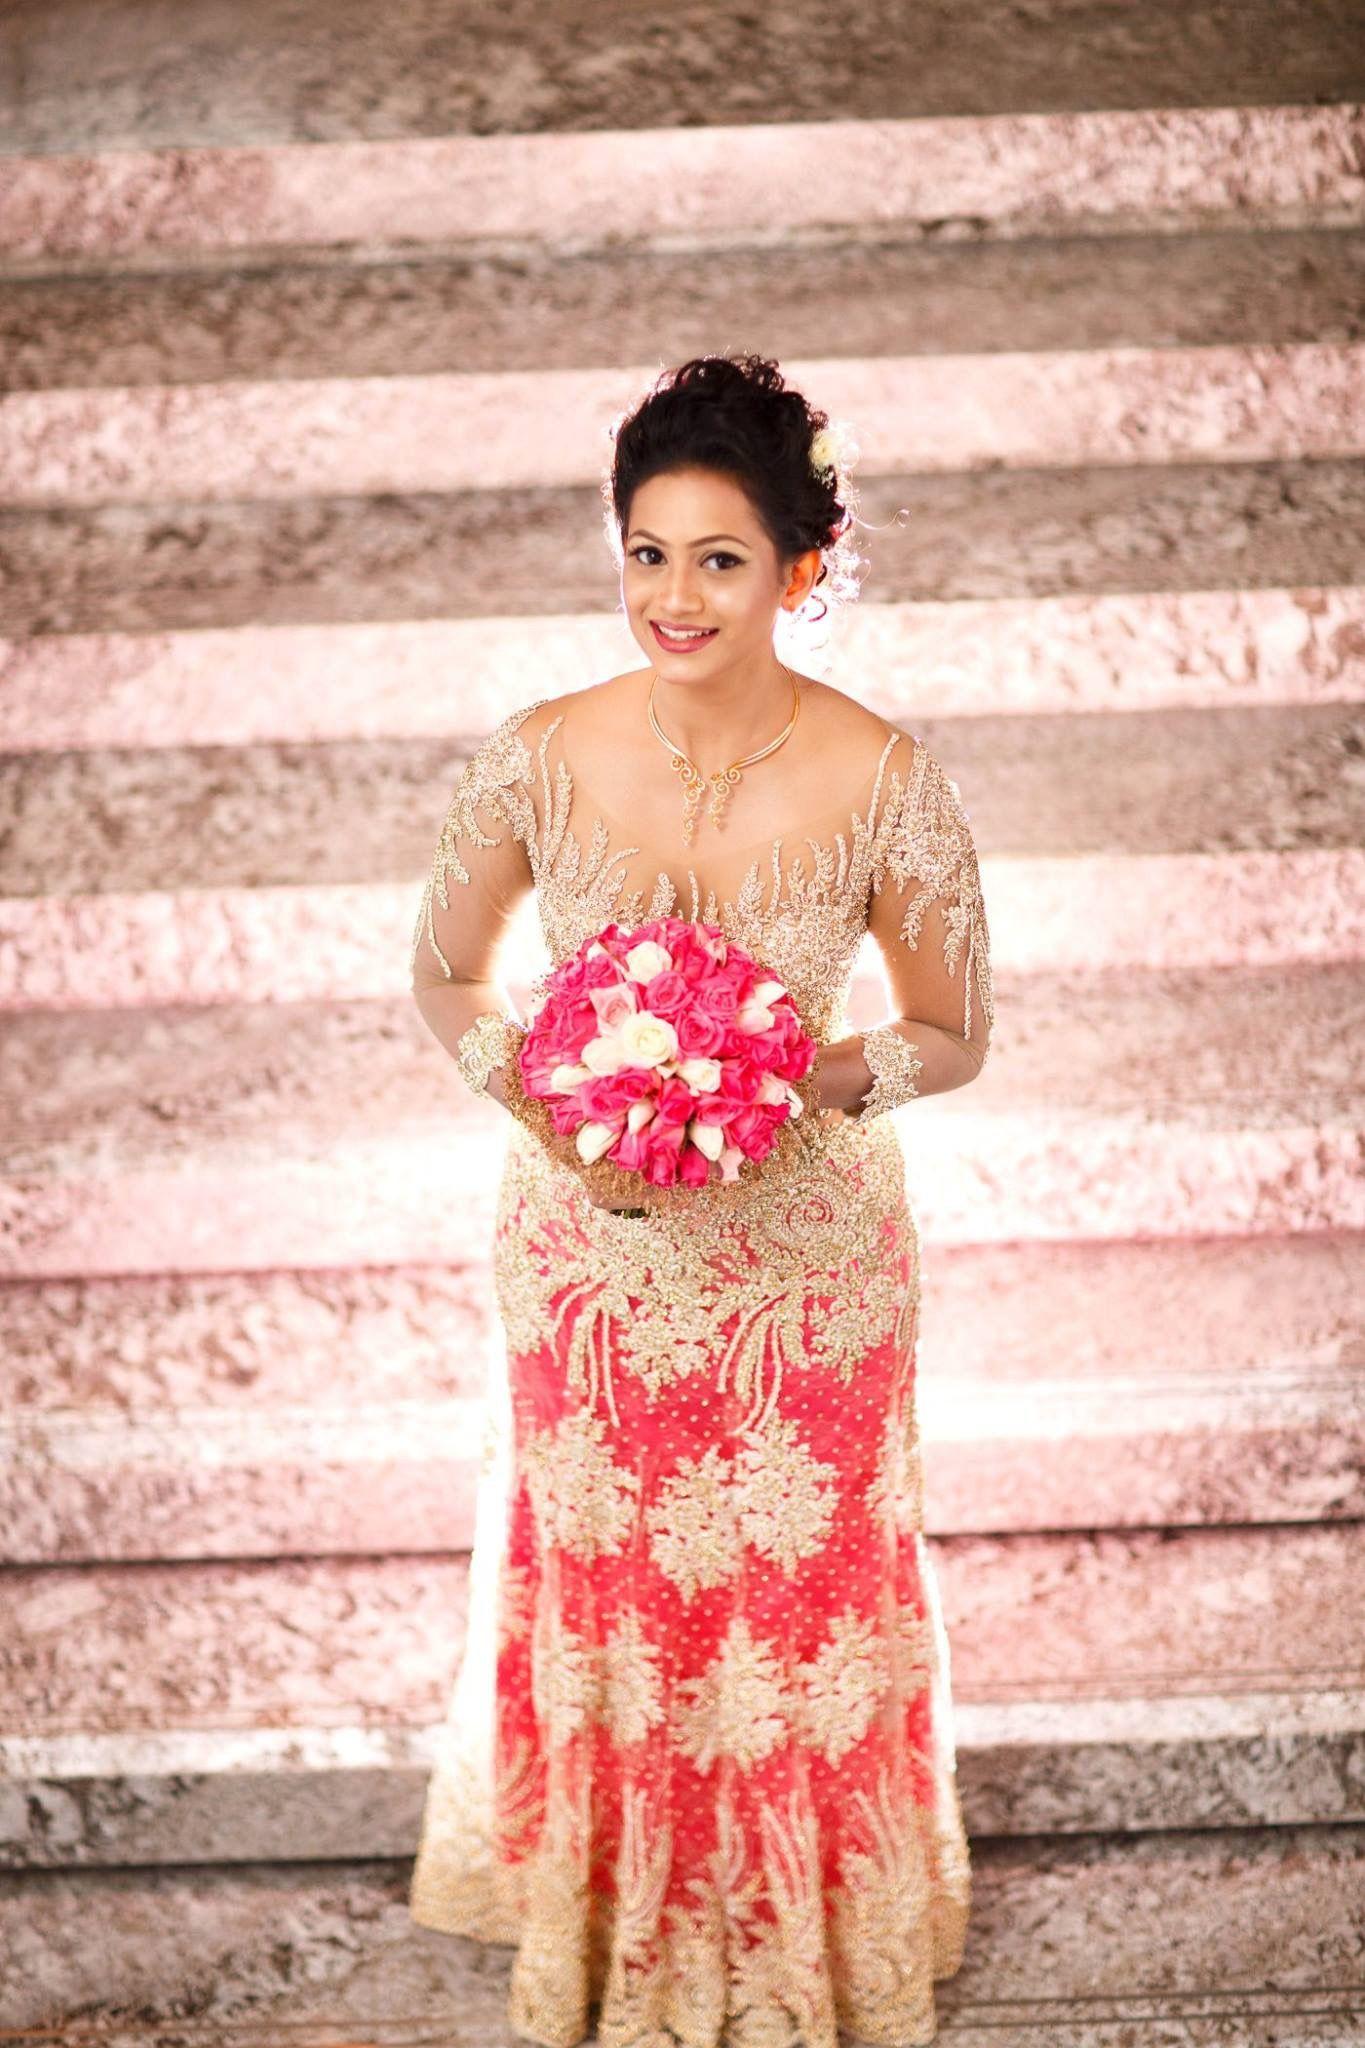 Srilanka Actress Long Frock - Kitchens Design, Ideas And Renovation